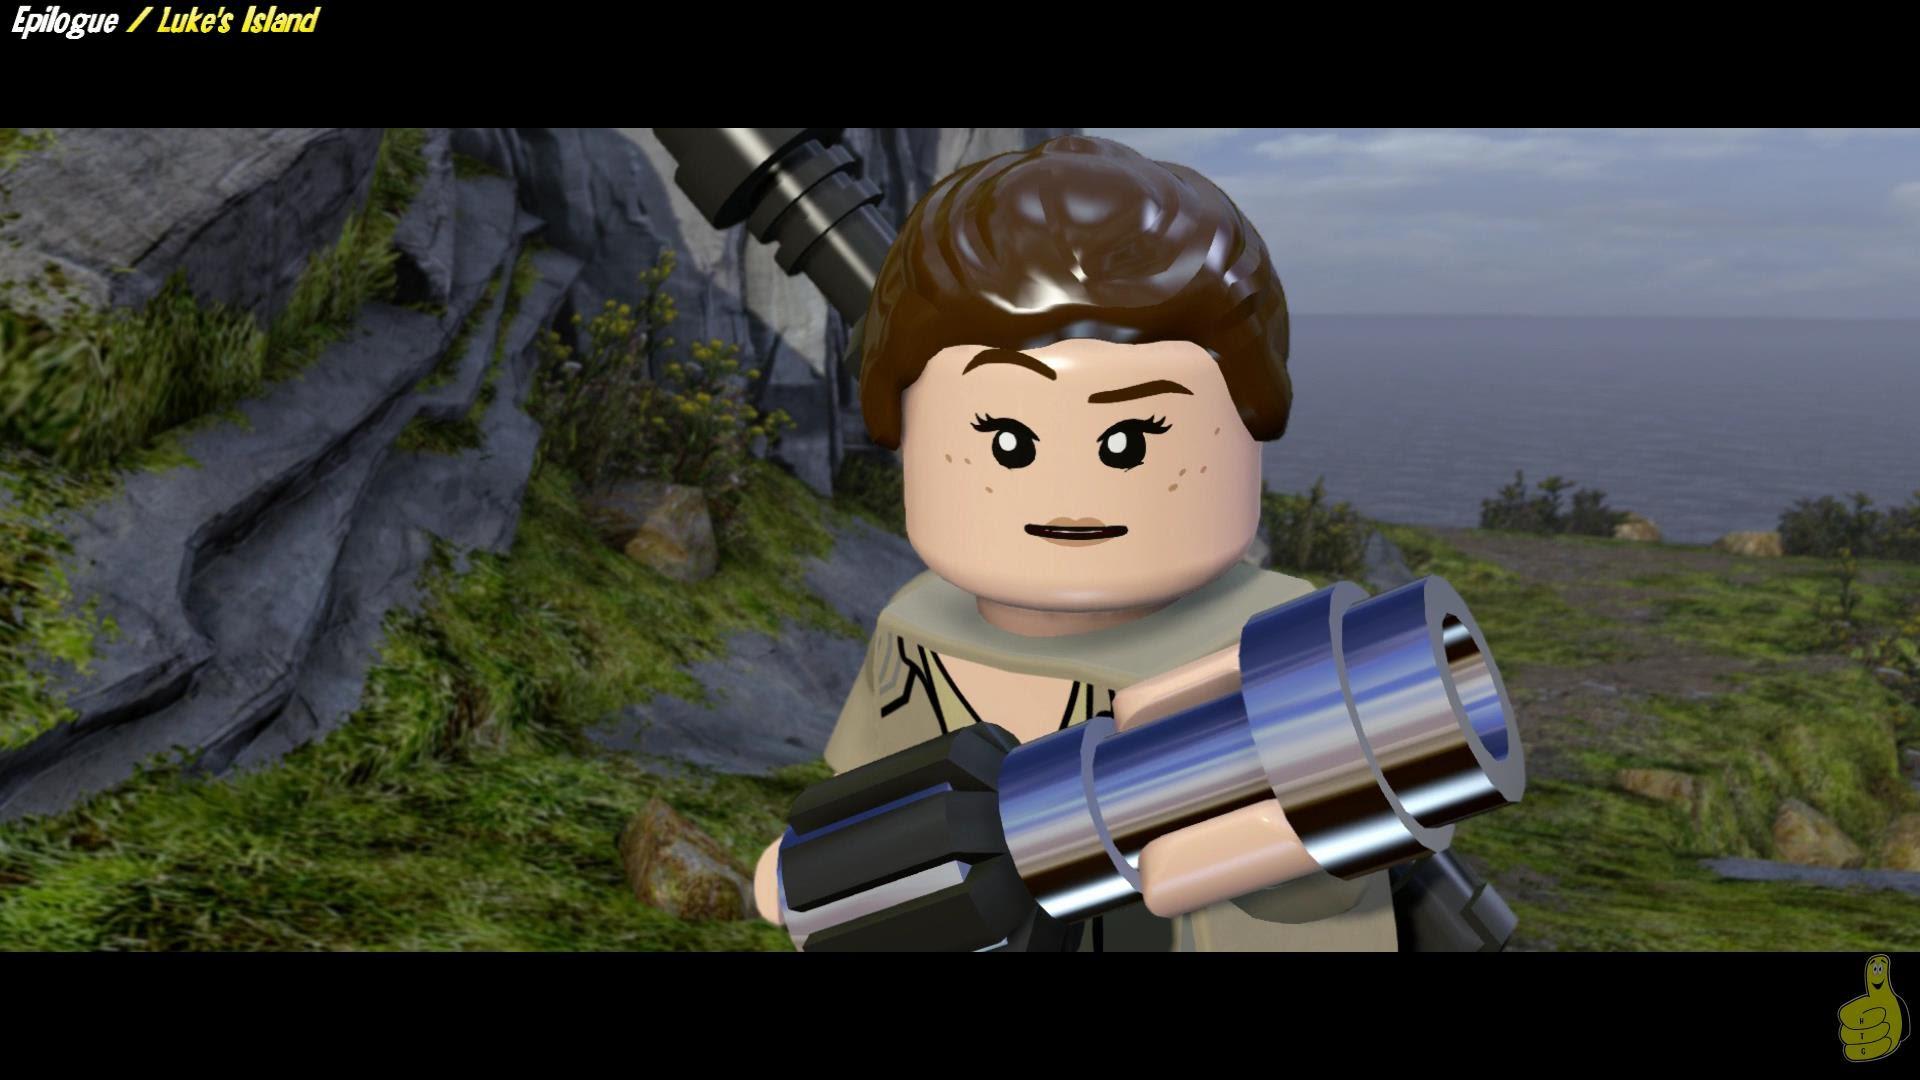 Lego Star Wars The Force Awakens: Epilogue / Luke's Island STORY – HTG